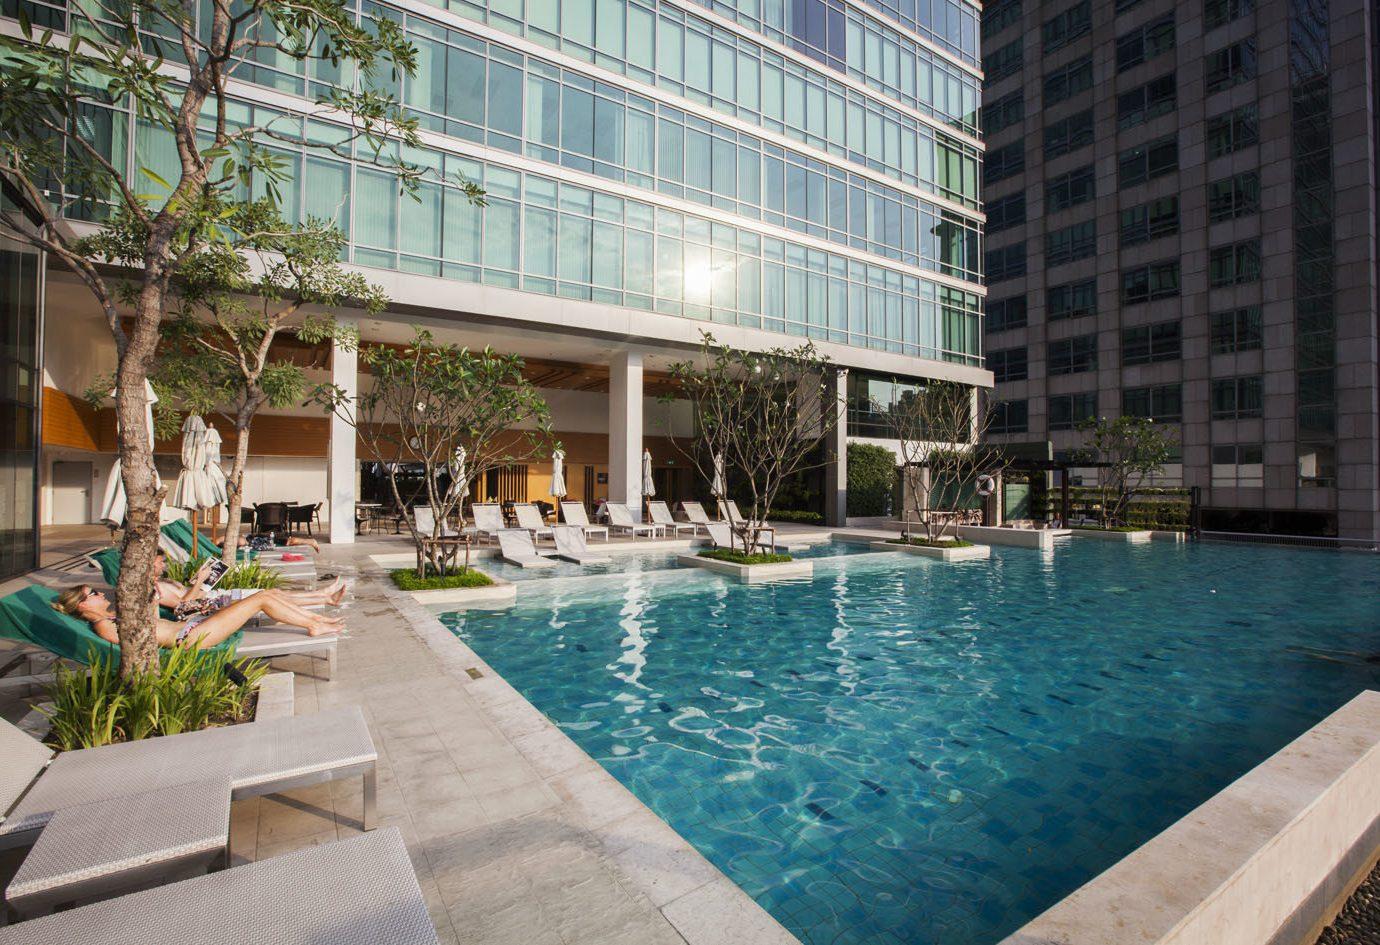 Trip Ideas building outdoor swimming pool condominium property leisure Resort Pool estate backyard mansion Villa Courtyard apartment